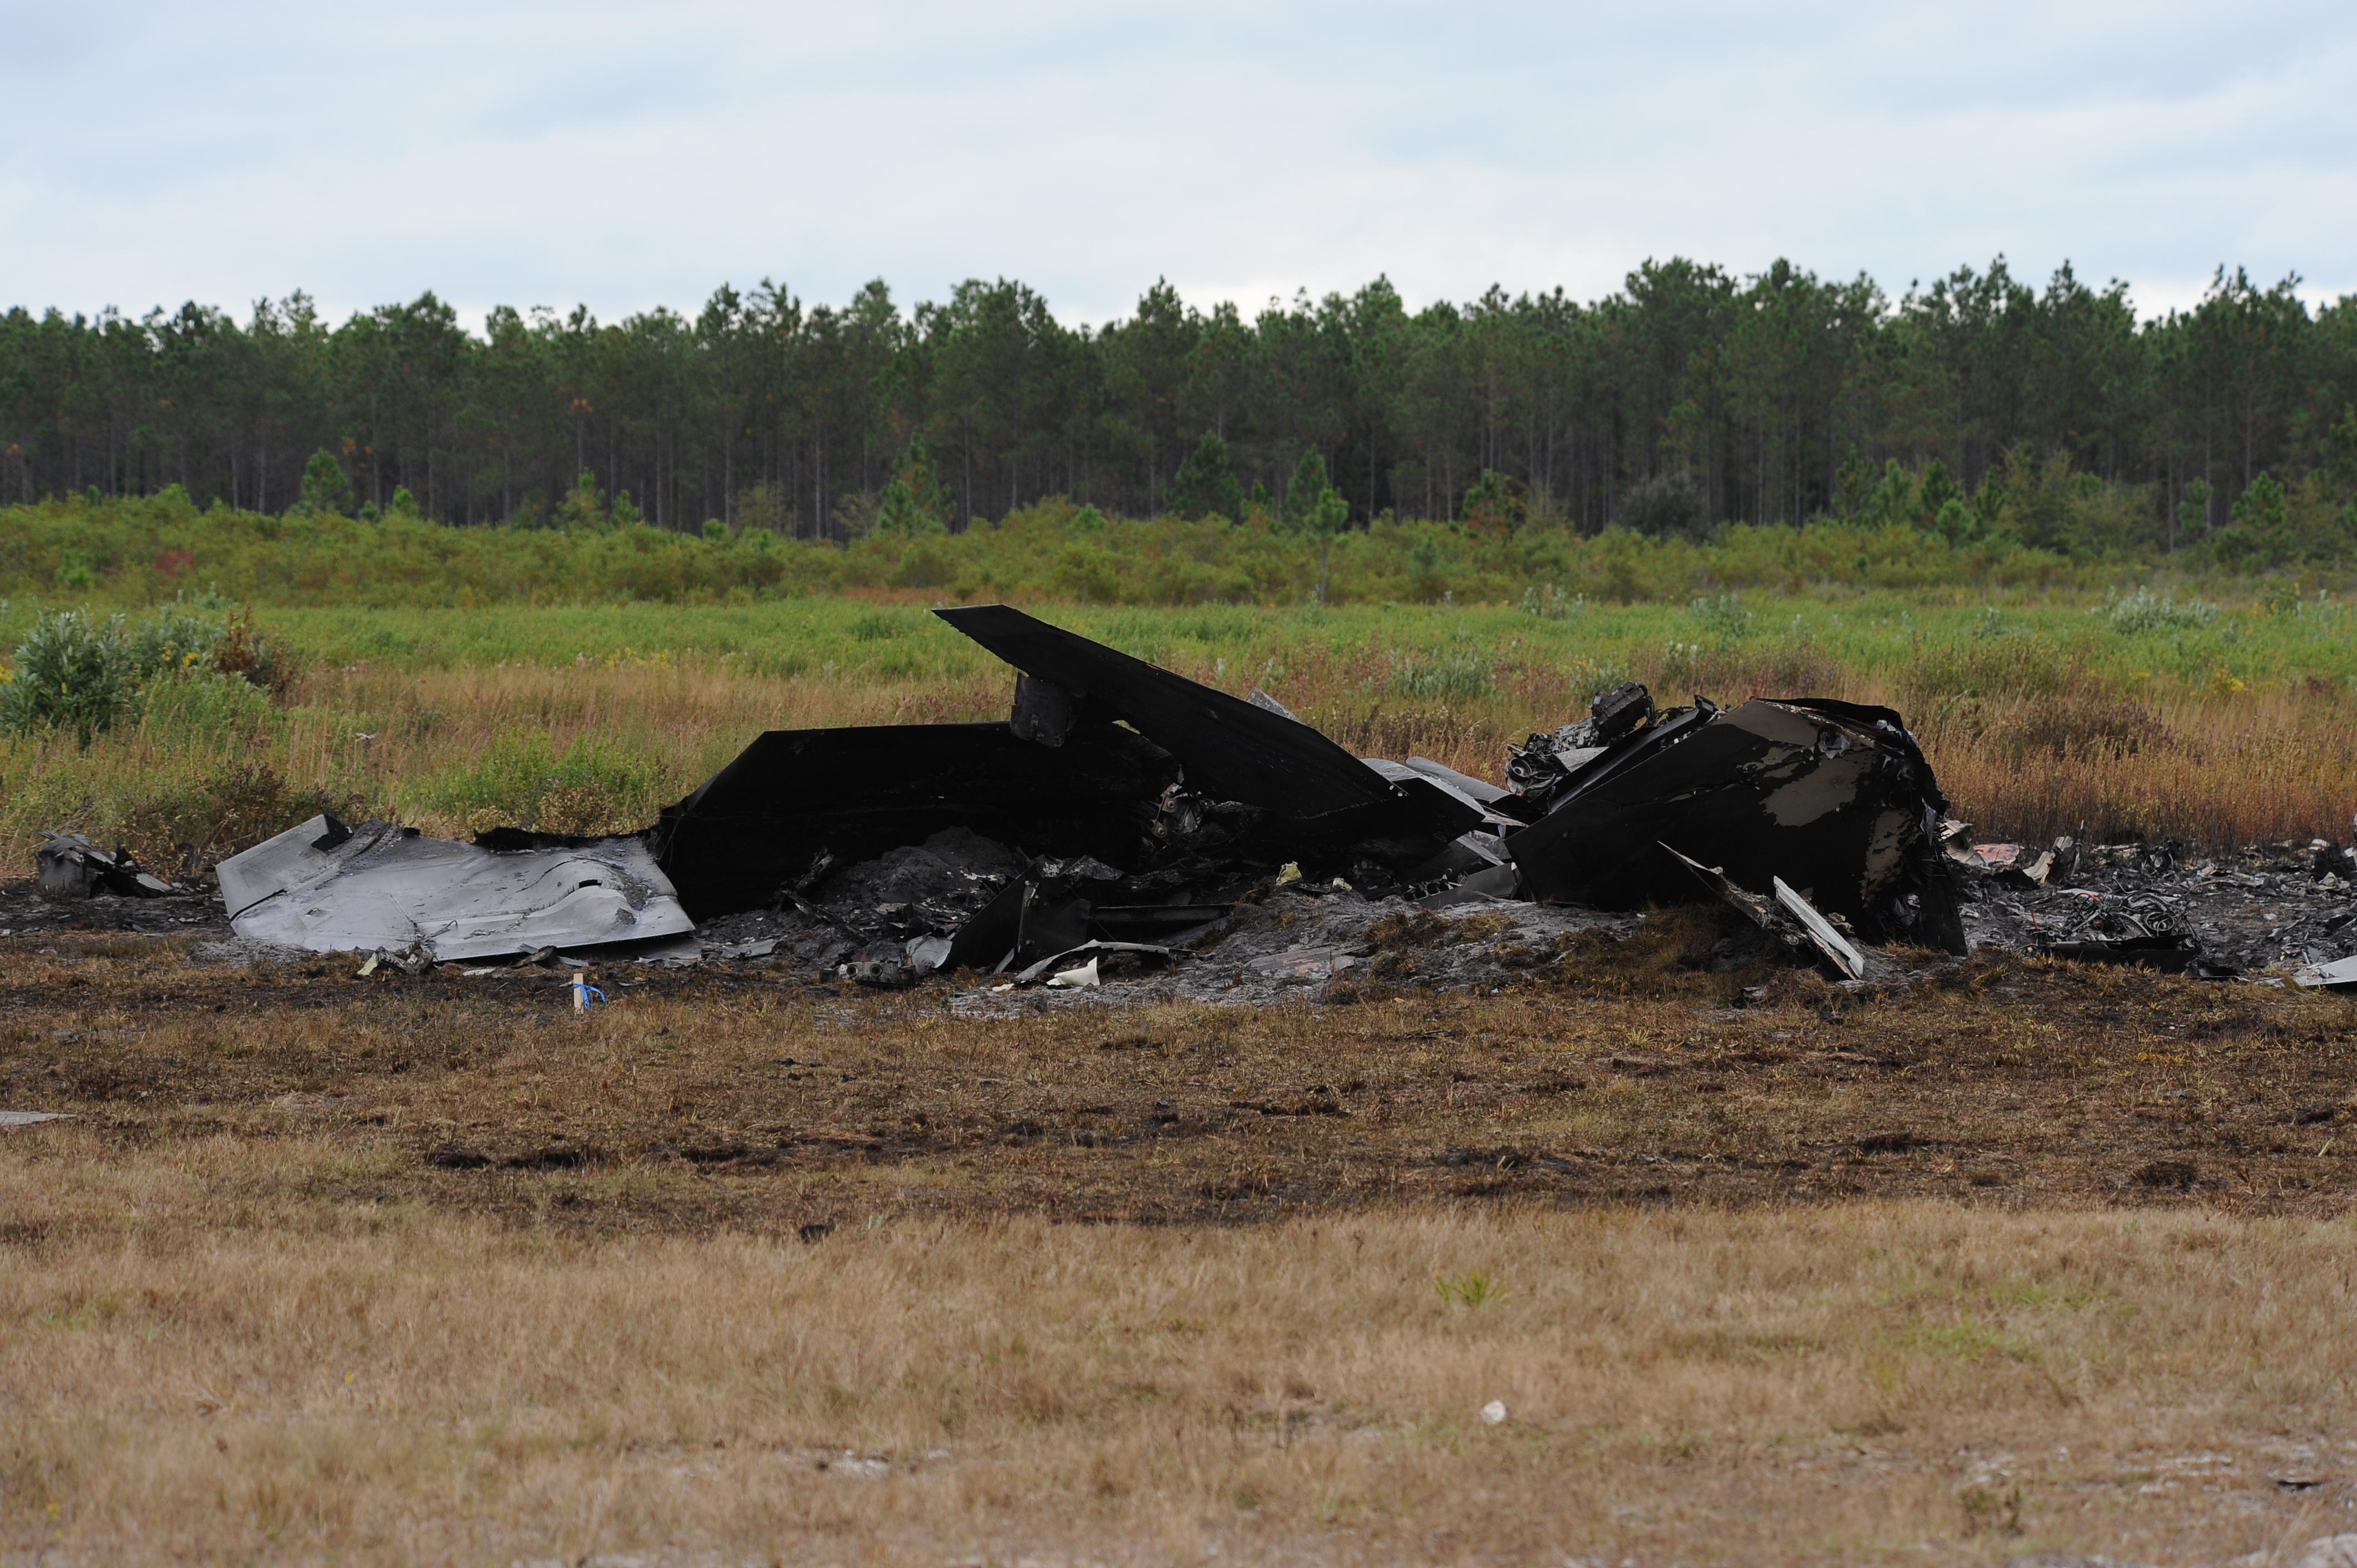 Initial F-22 crash photos > Tyndall Air Force Base > Article Display